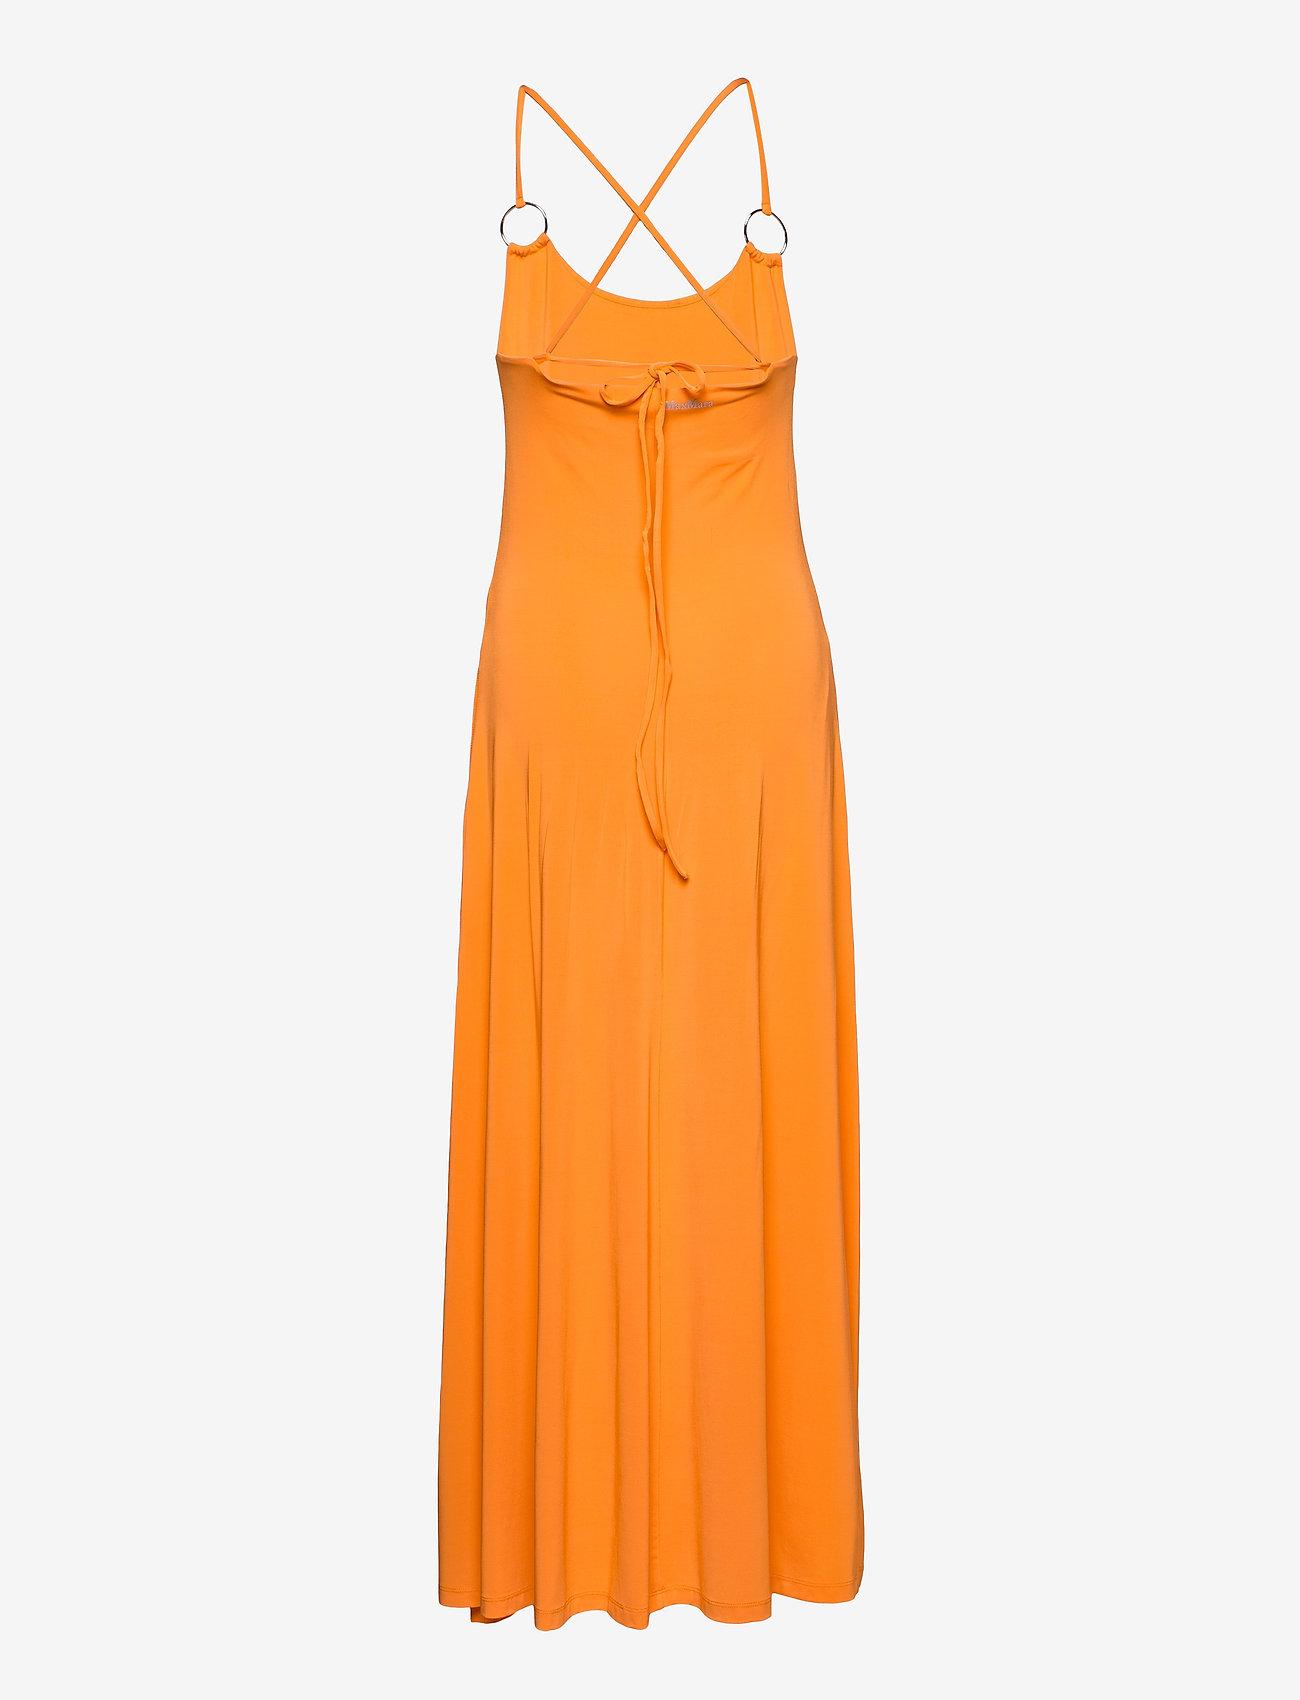 Max Mara Leisure - CREMONA - beachwear - orange - 1